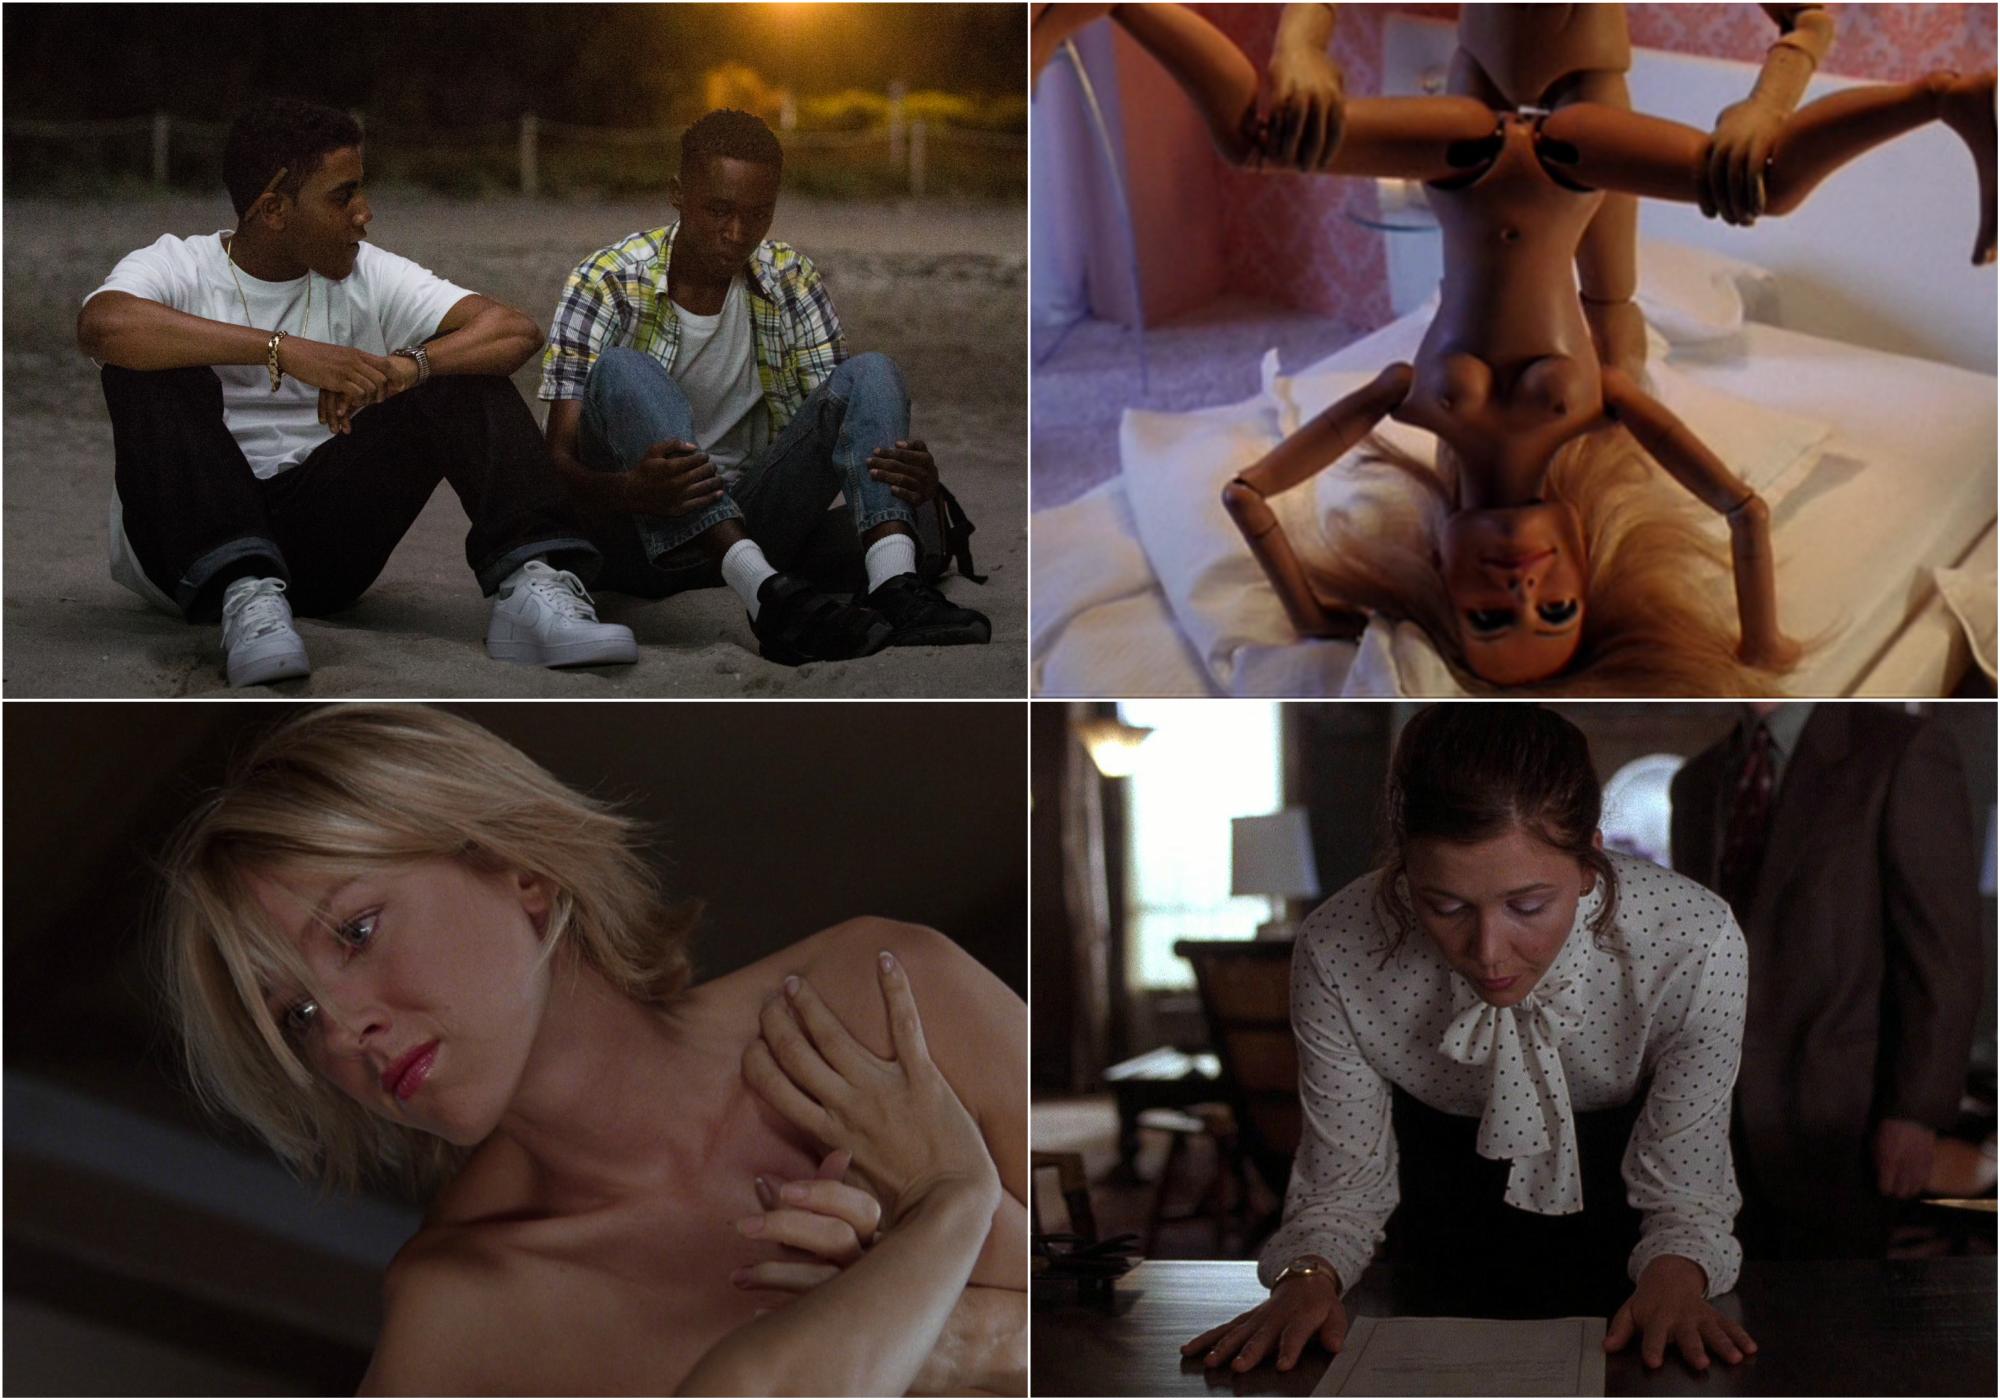 hottest scene rank sex